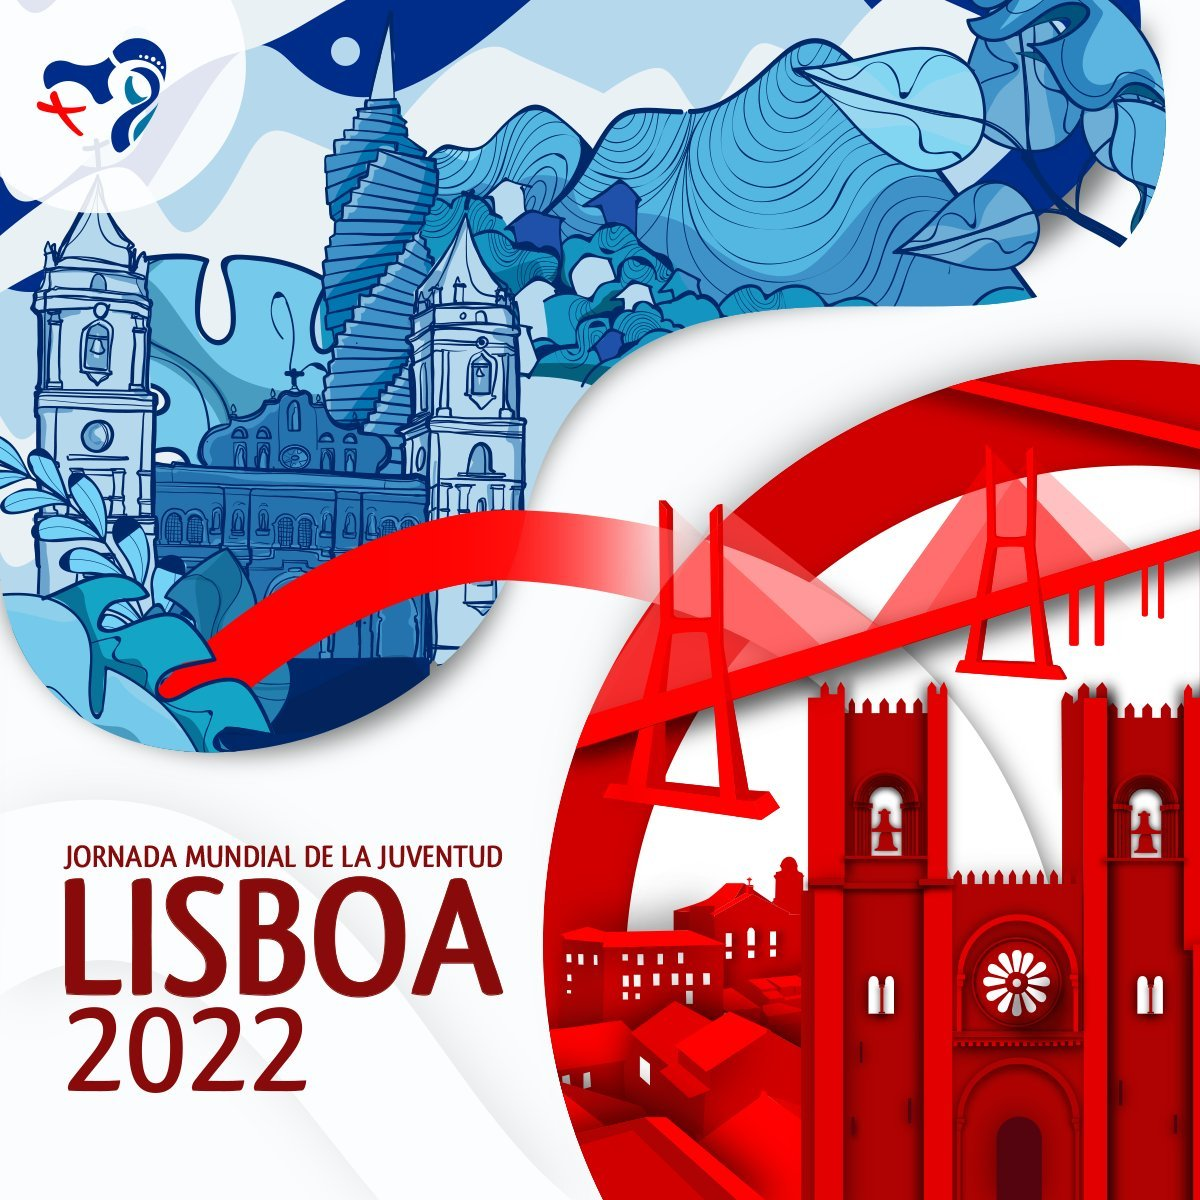 Lisboa, próxima sede de la JMJ 2022